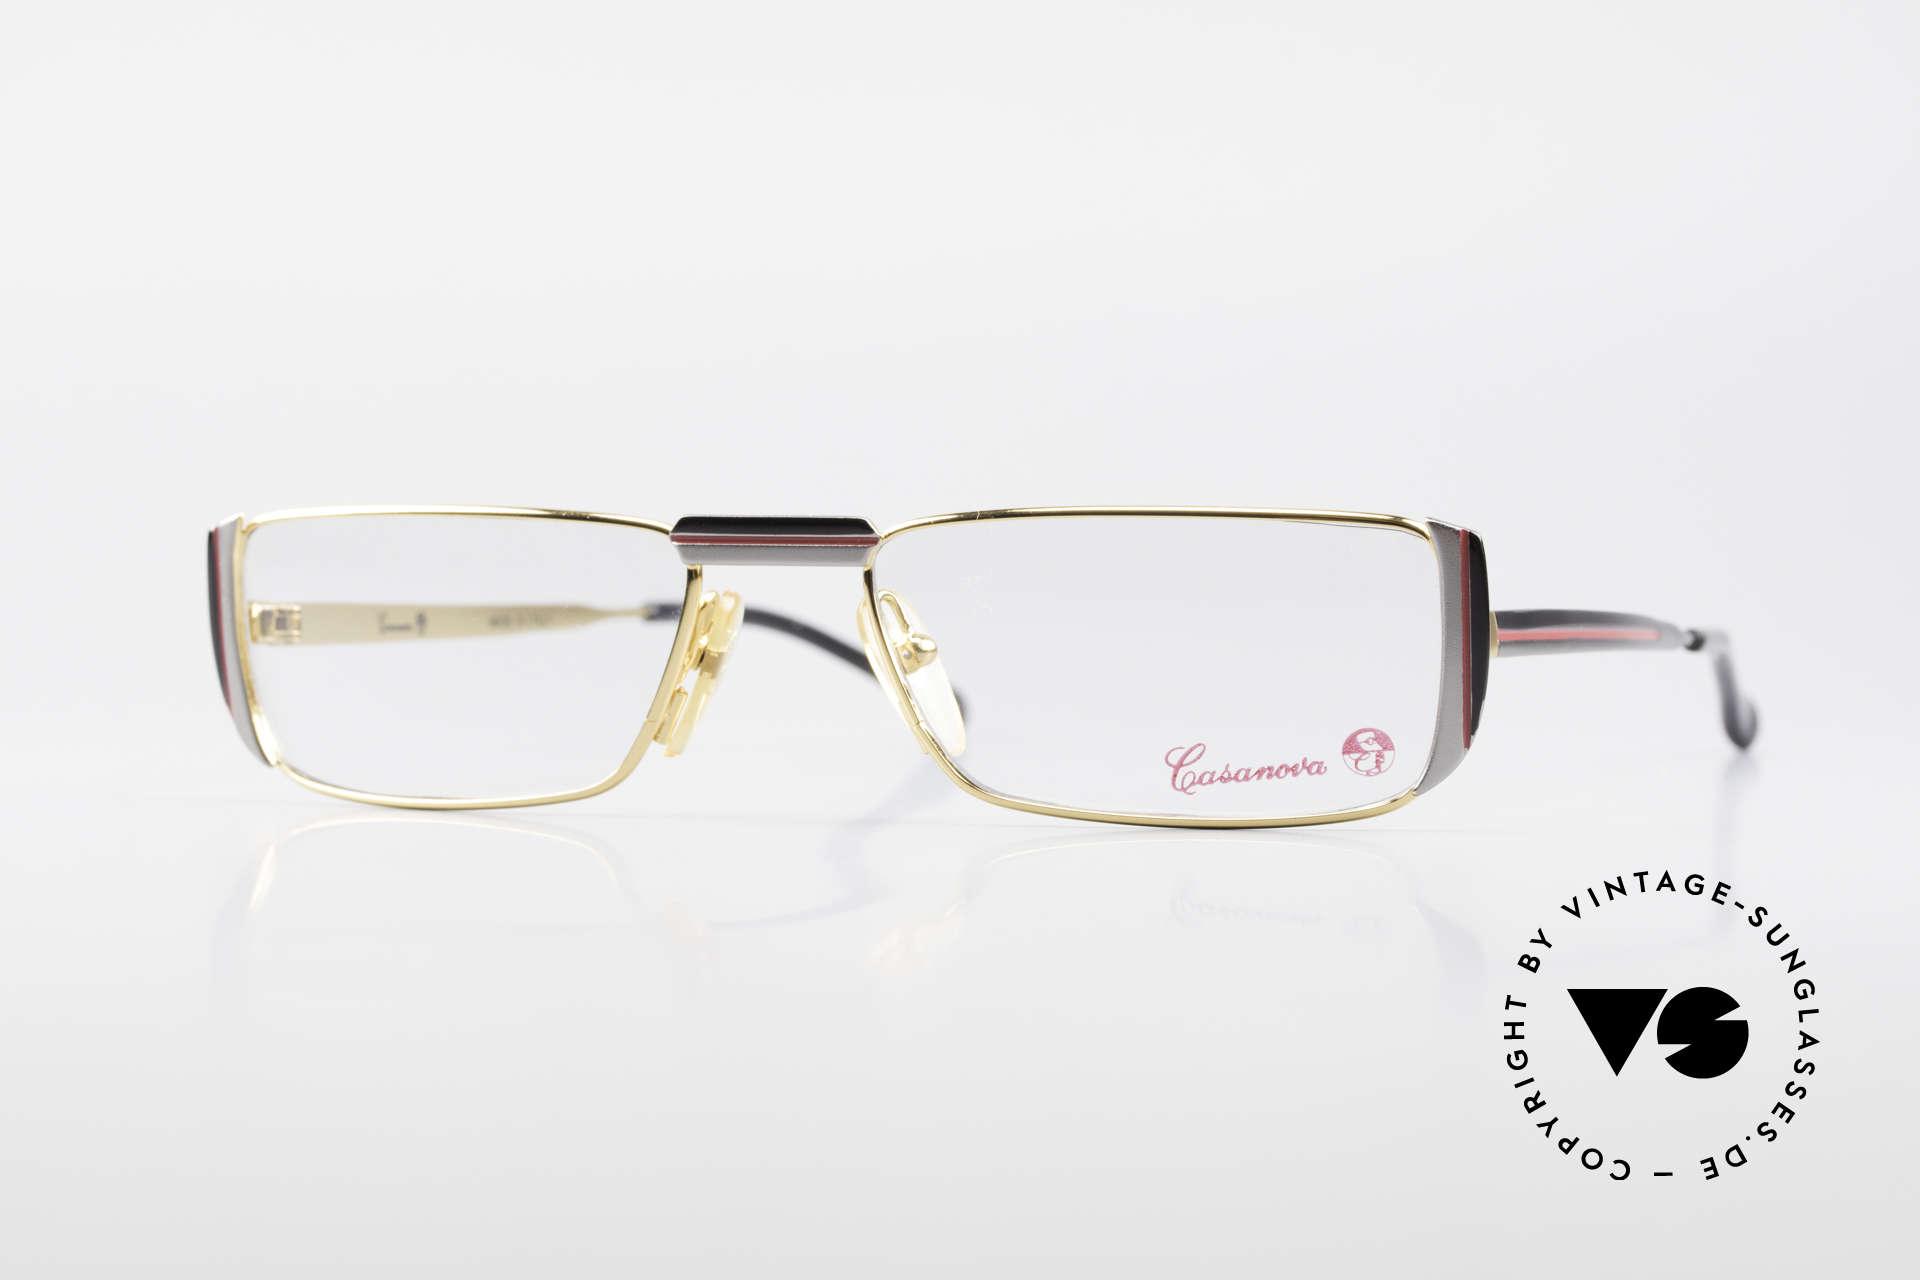 Casanova NM3 Square Reading Eyeglasses 80s, striking vintage 1980's Casanova reading eyeglasses, Made for Men and Women